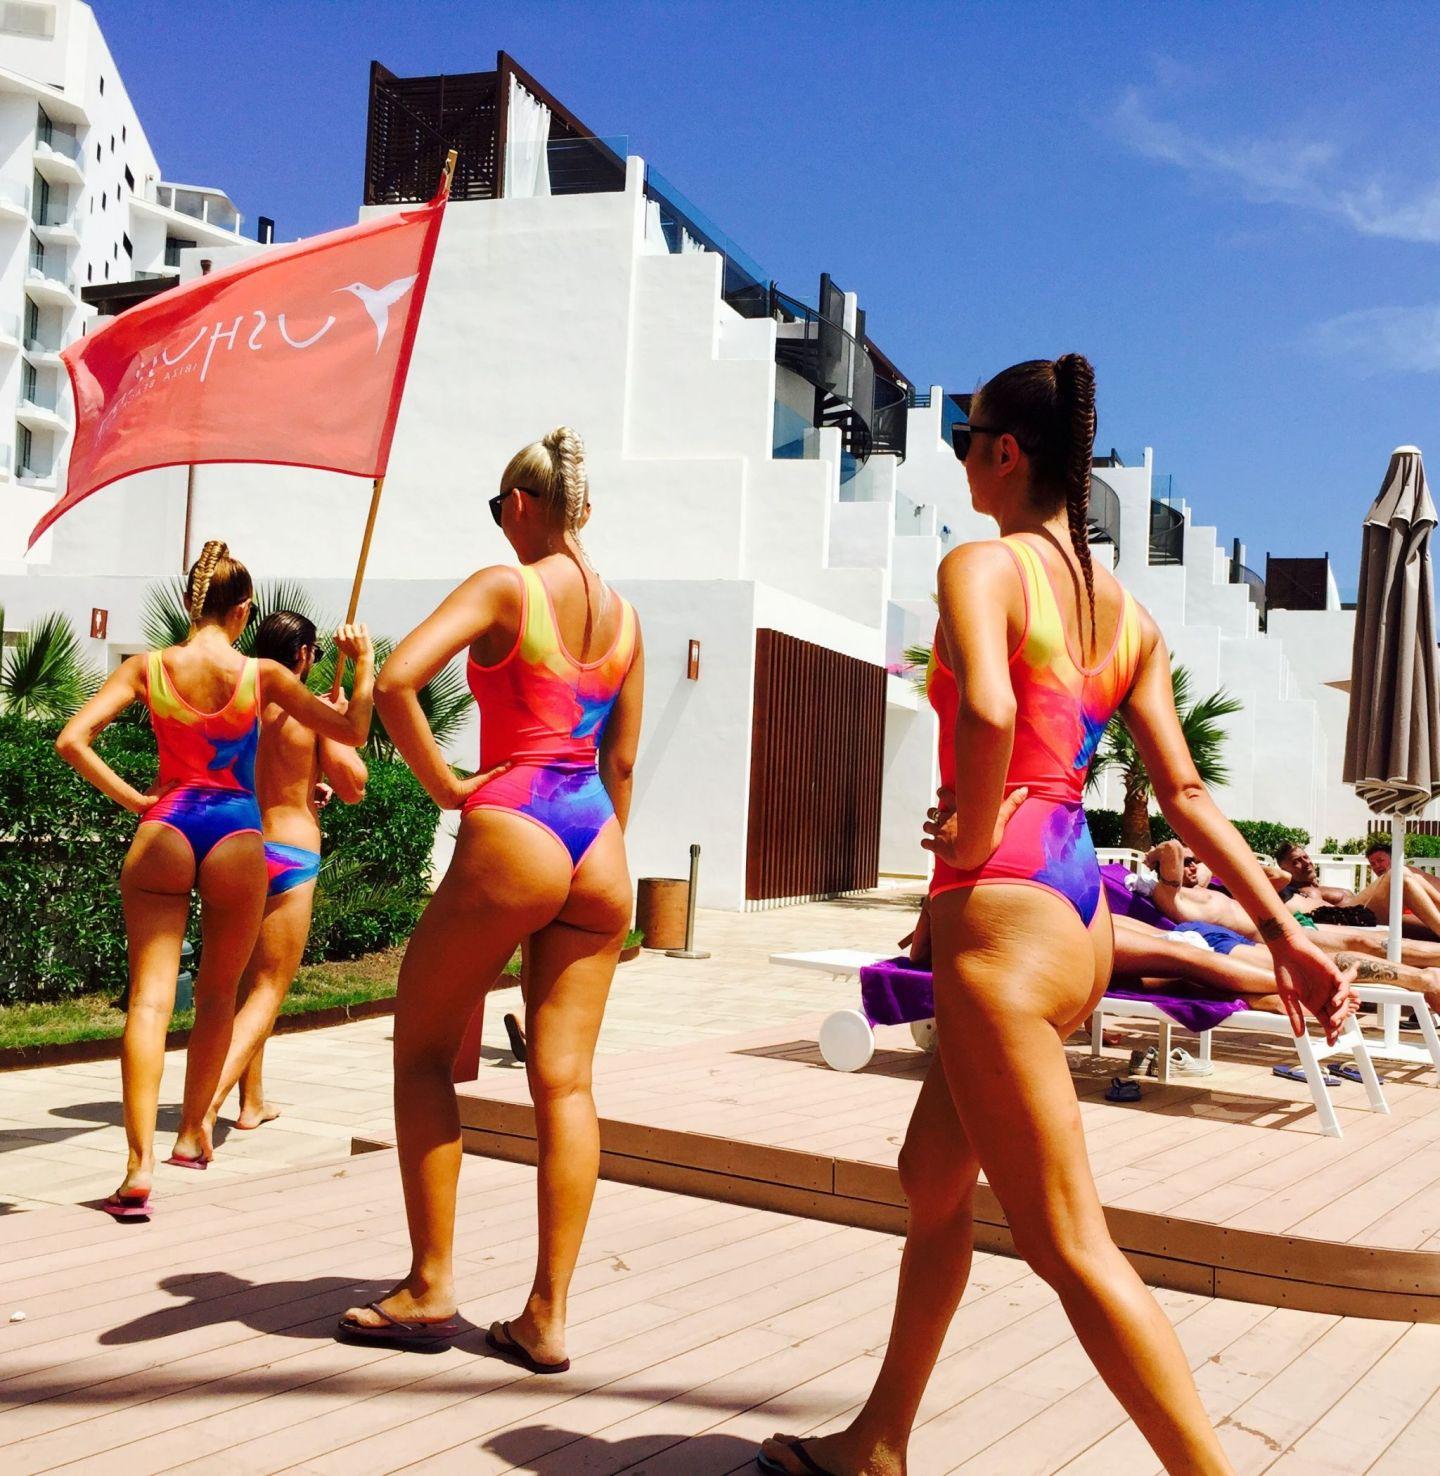 Ushuaia promo staff in Ibiza